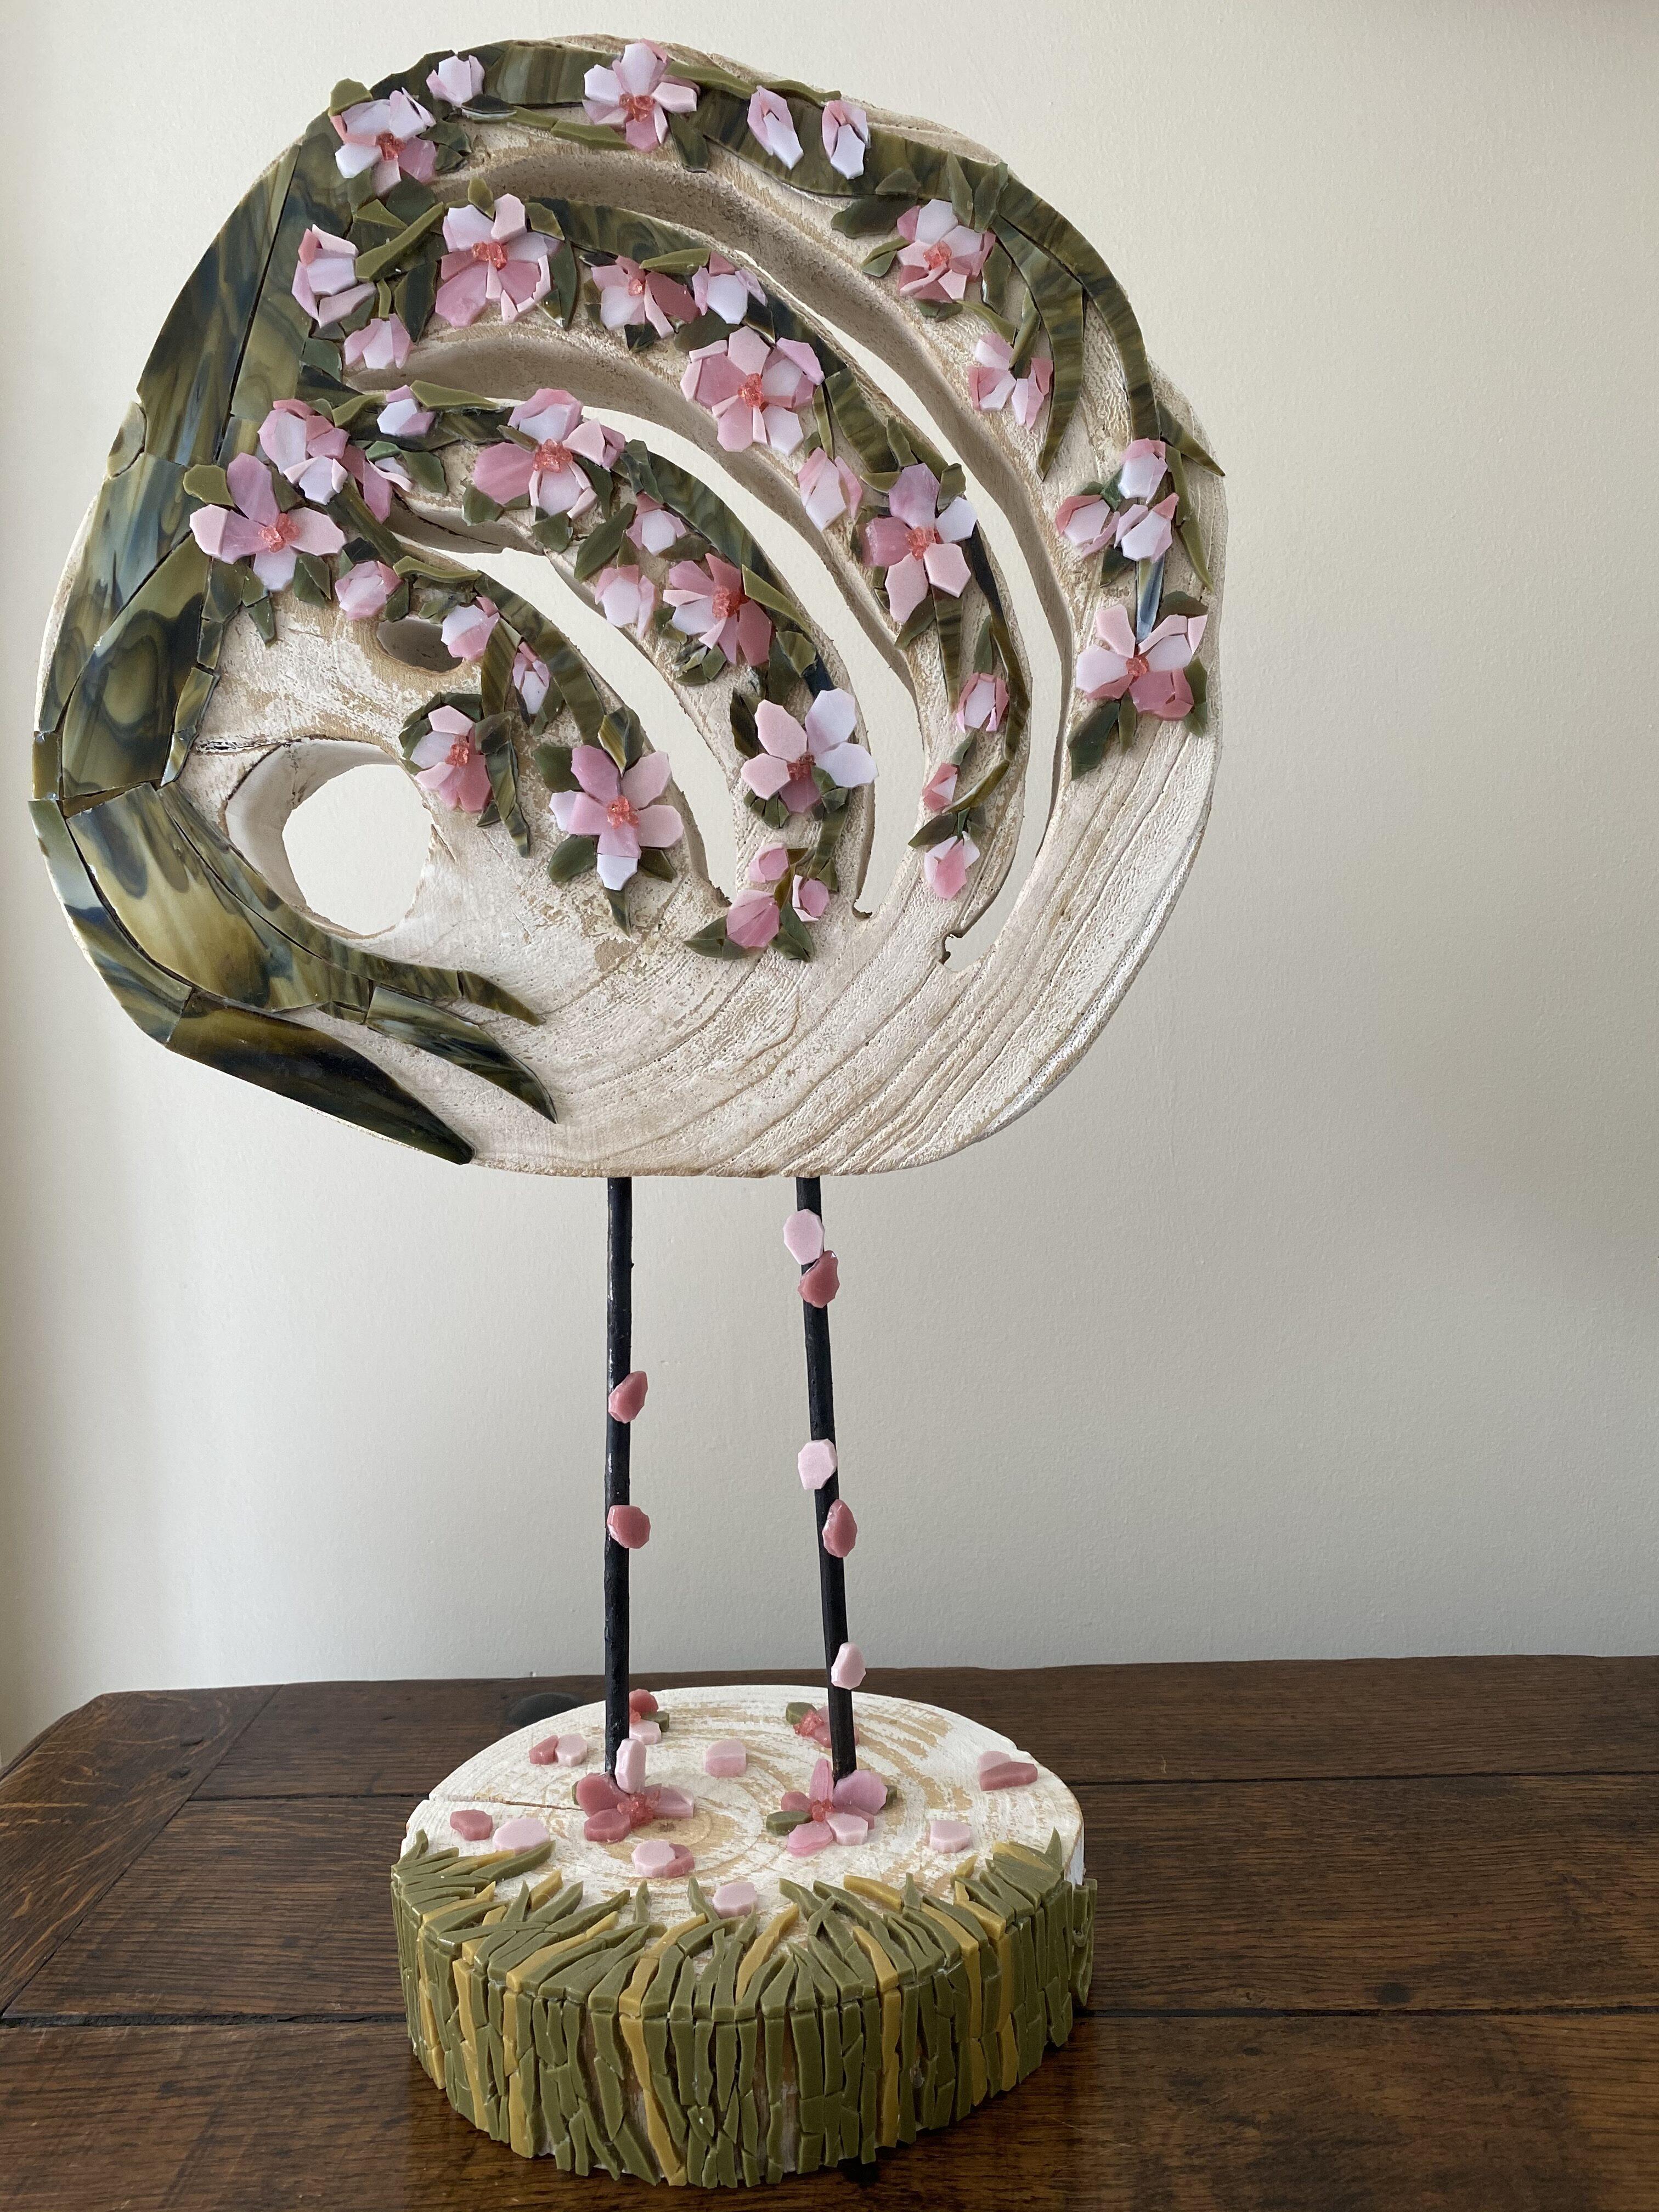 Esmeralda Bassi - Le cerisier du Japon